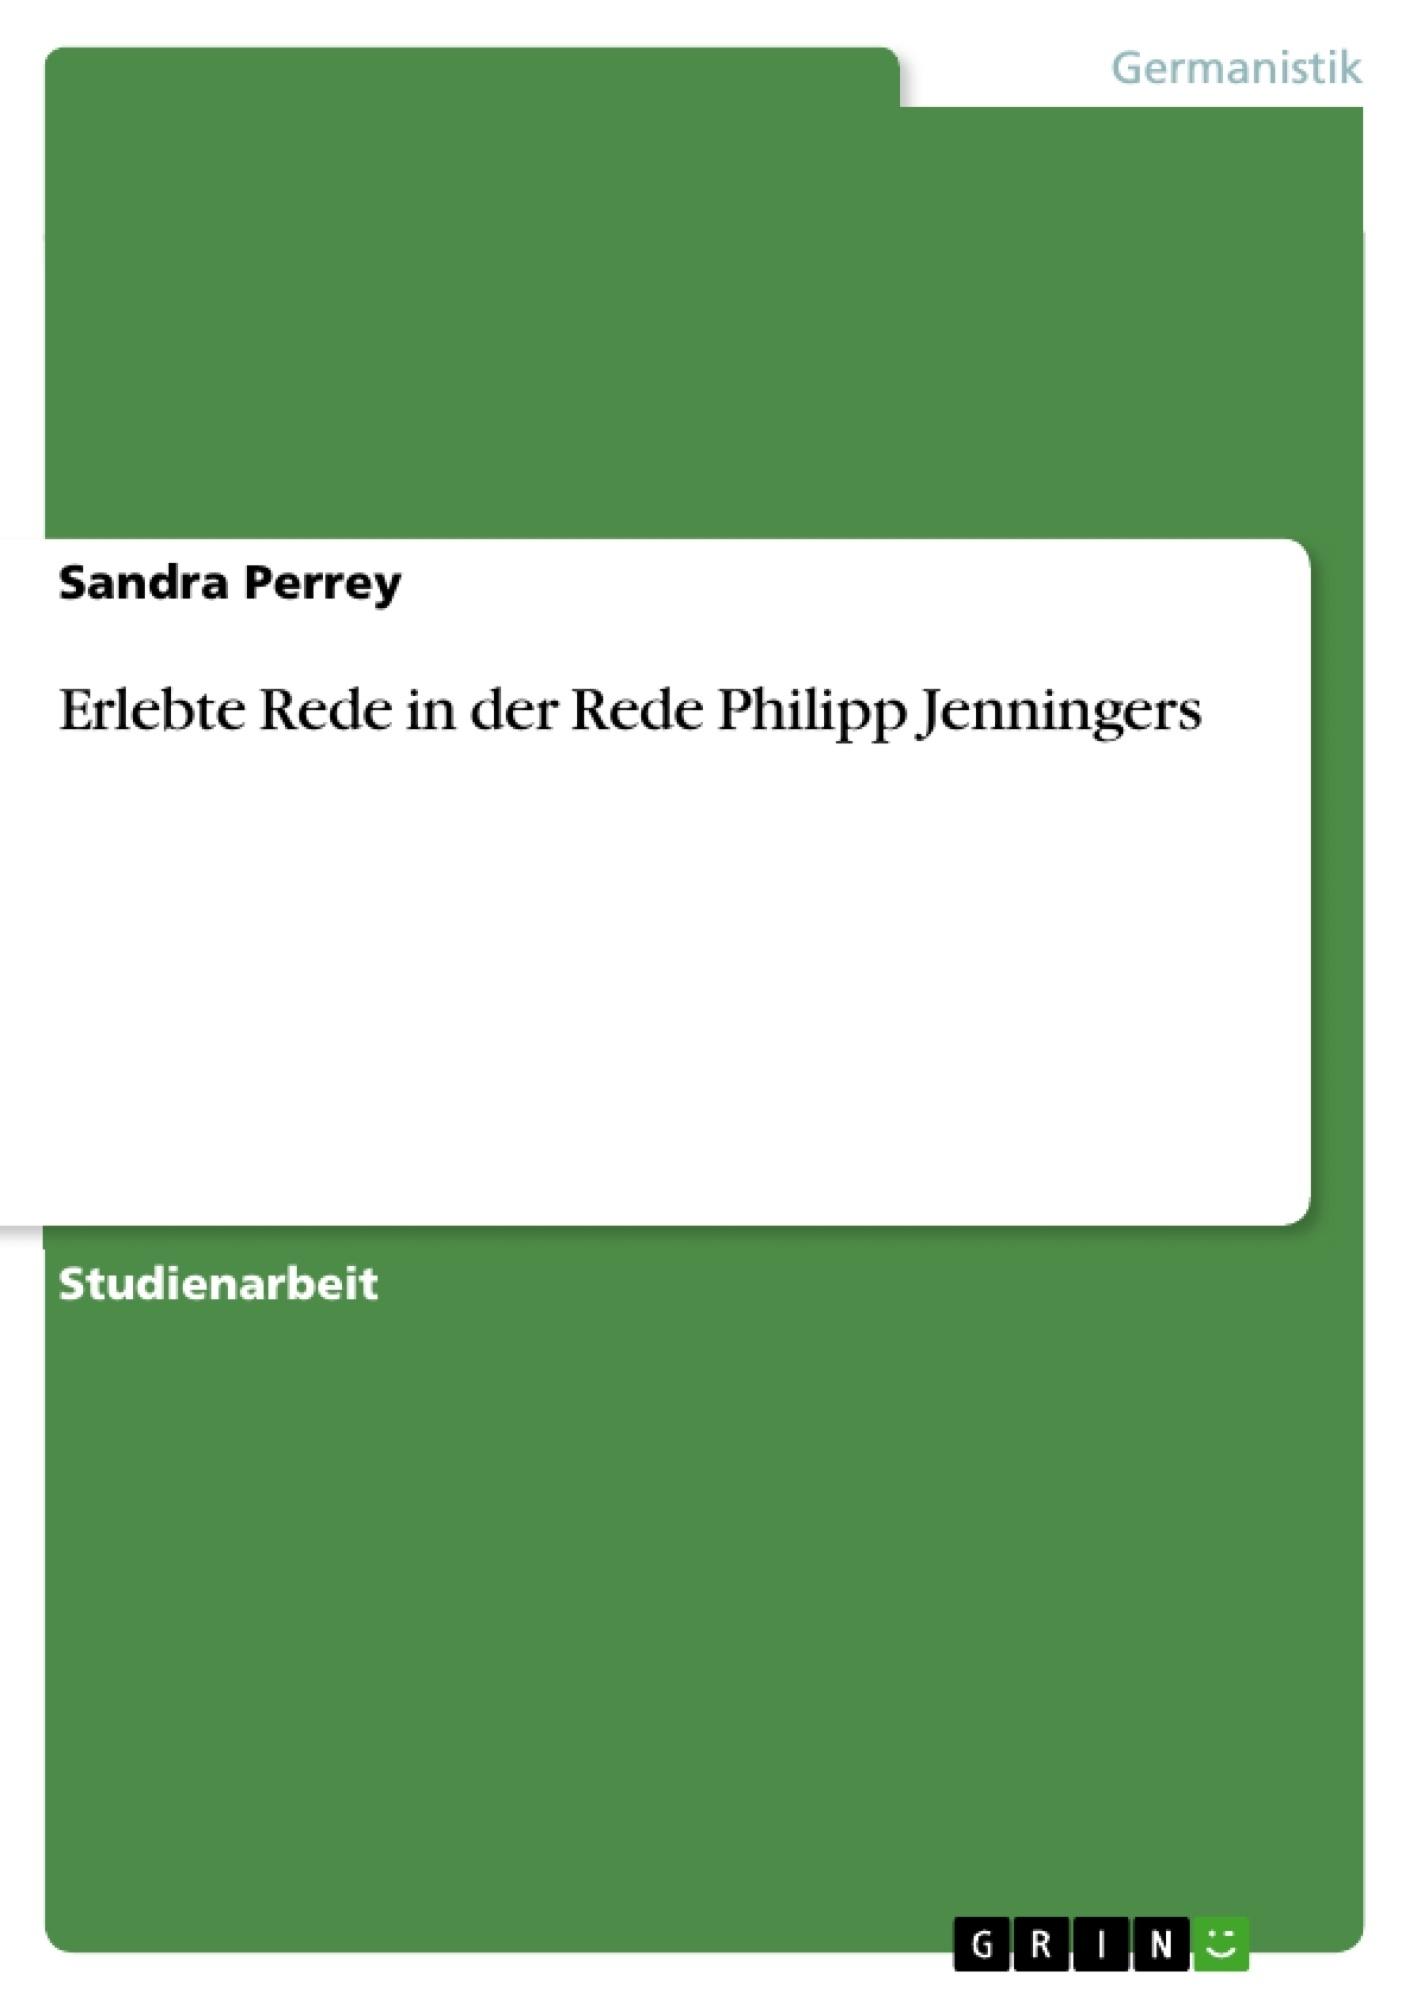 Titel: Erlebte Rede in der Rede Philipp Jenningers